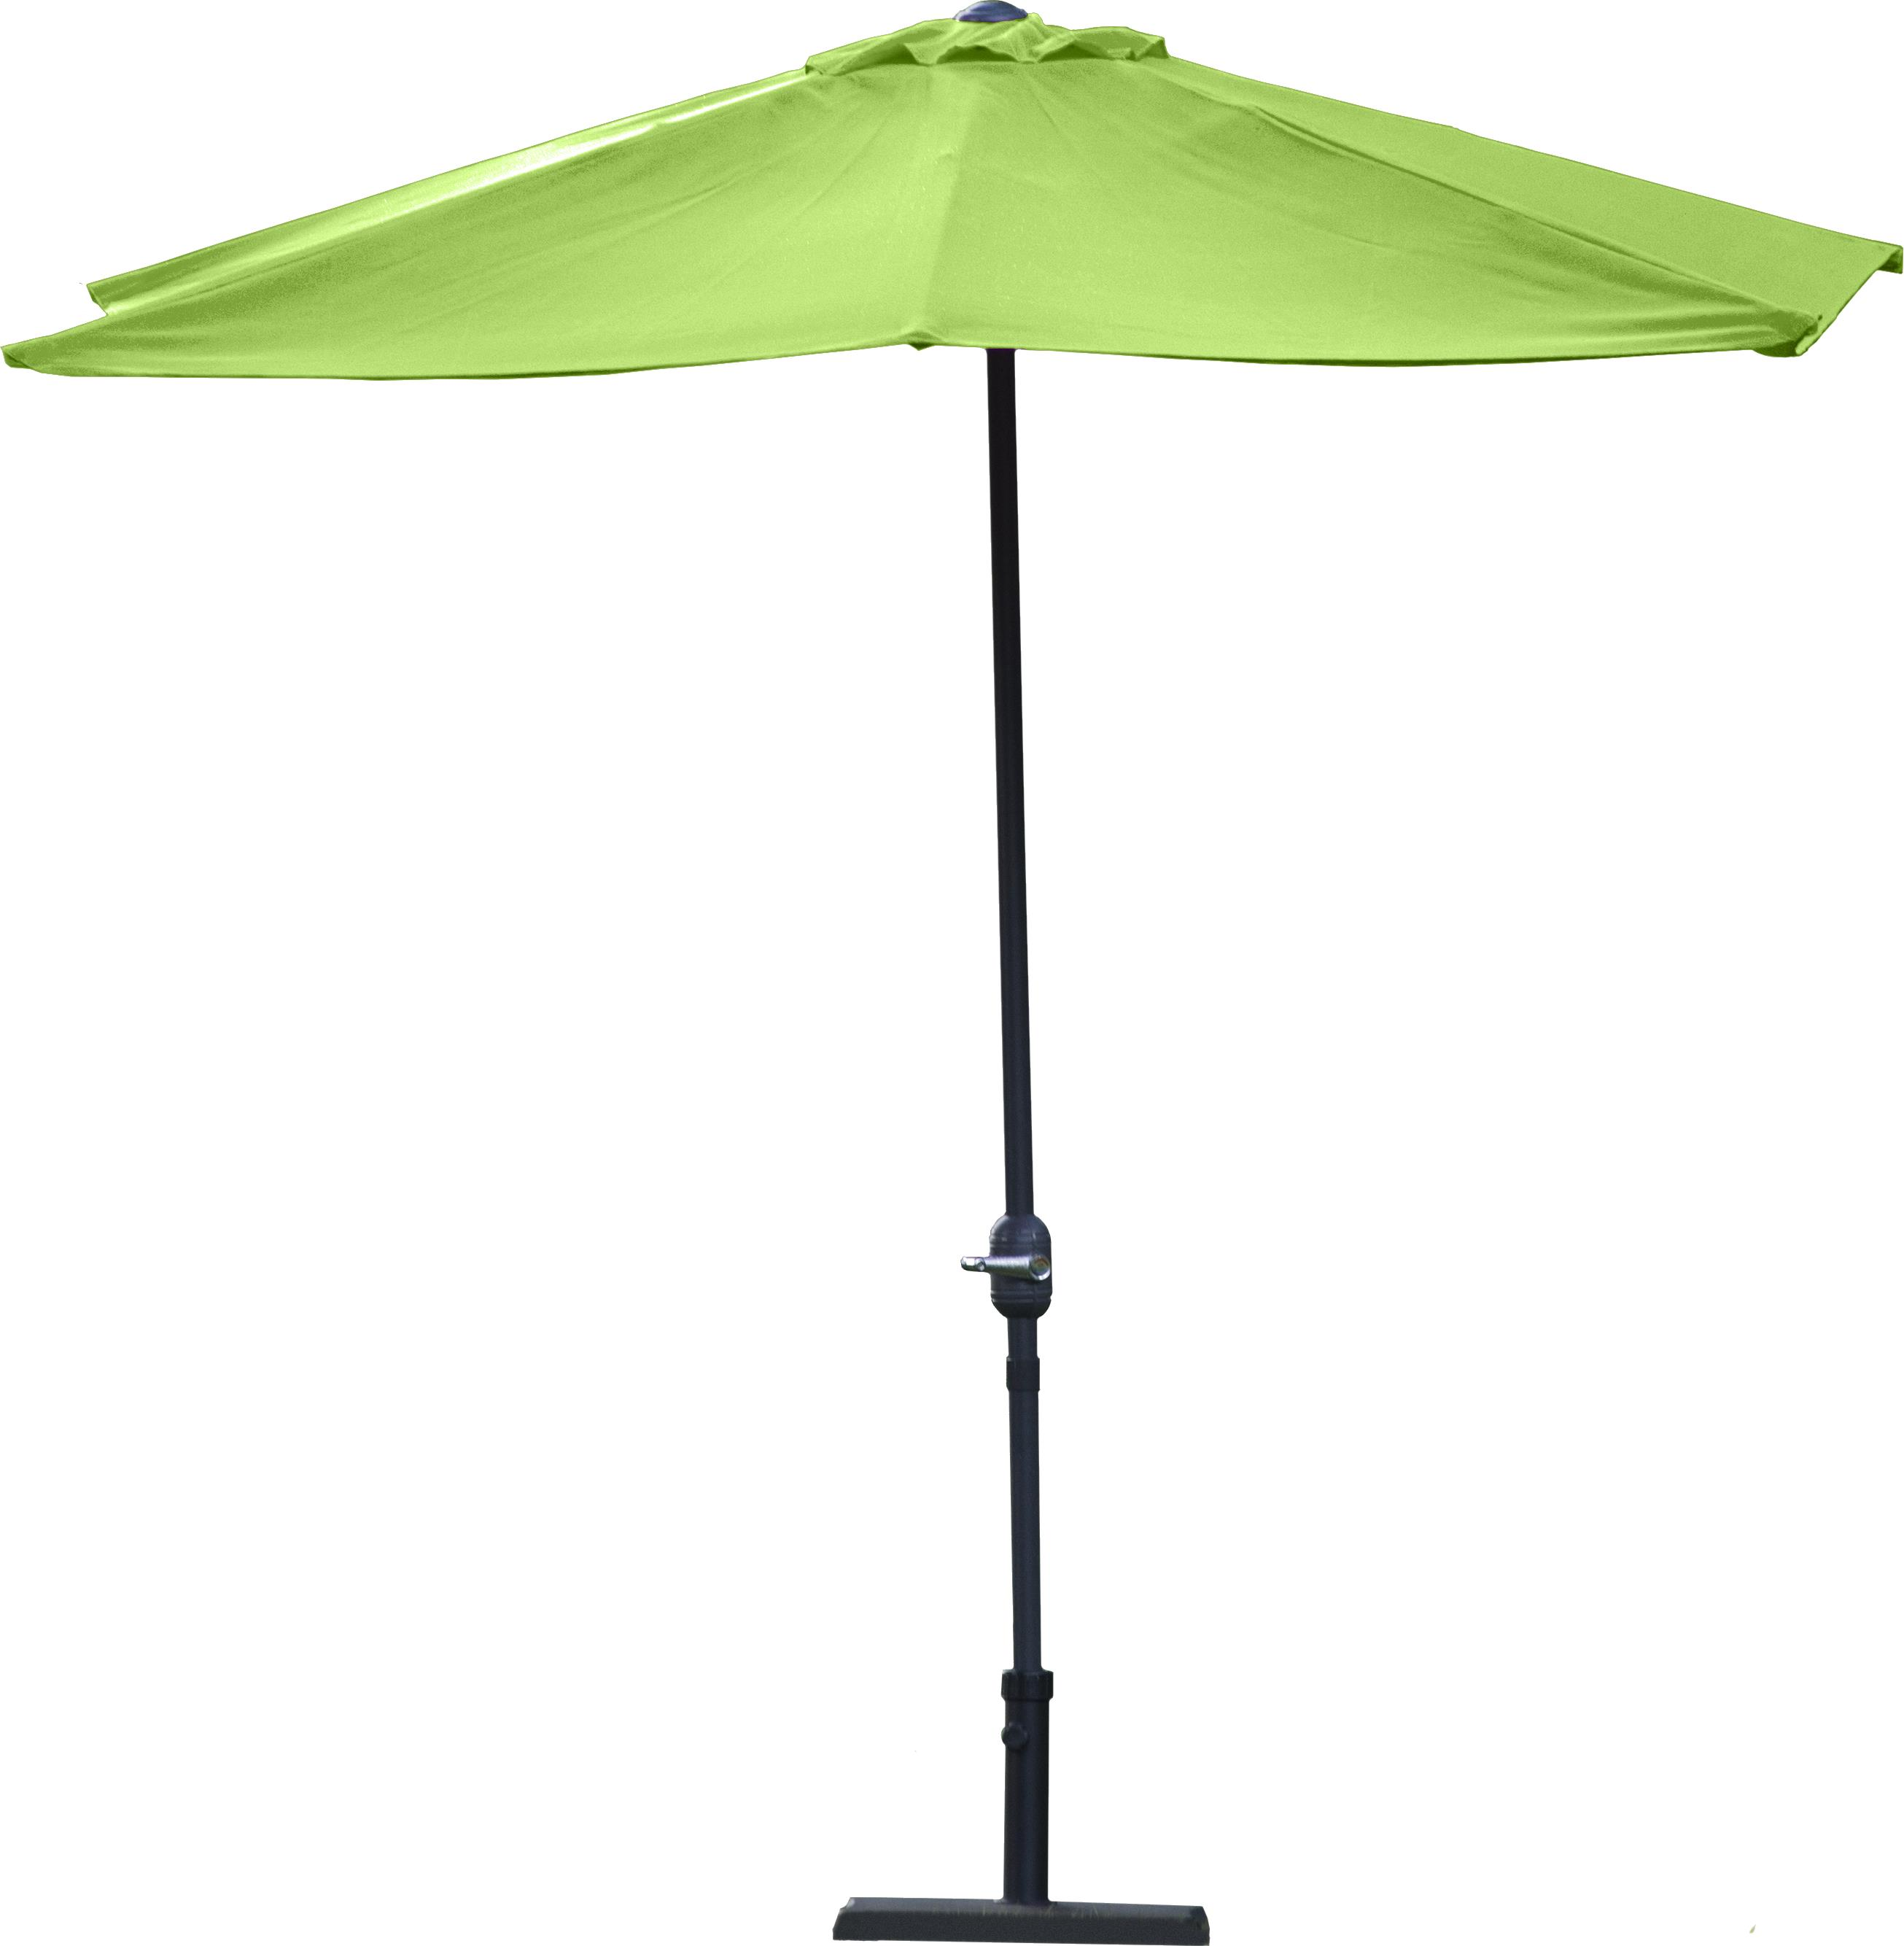 demi parasol rectangulaire aubergine 2 30 m x 1 30 m. Black Bedroom Furniture Sets. Home Design Ideas